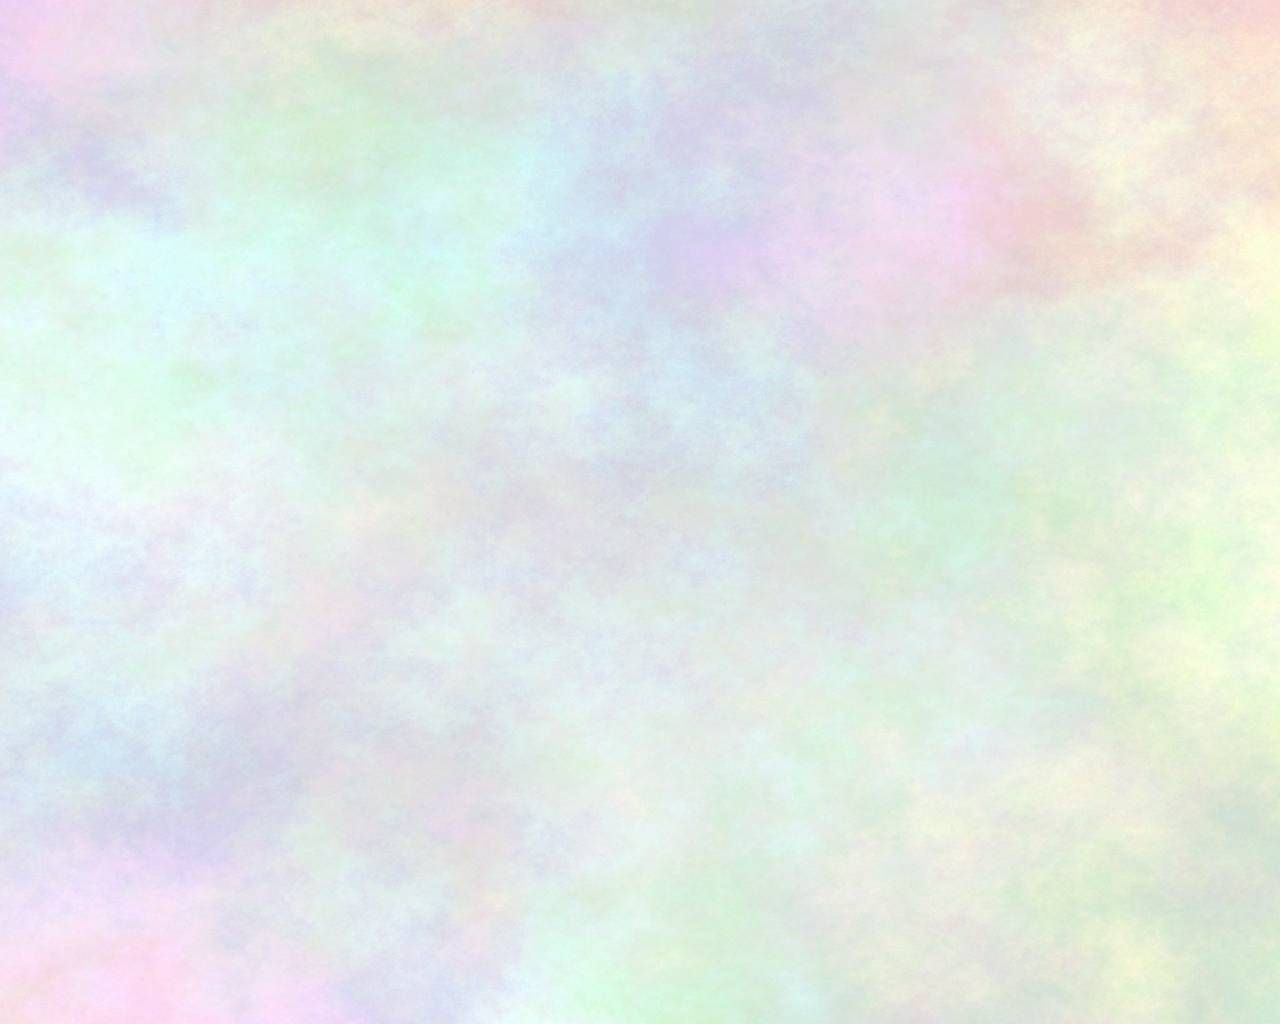 Pin Oleh Madison Tibbetts Di Pastels Latar Belakang Pastel Wallpaper Pastel Gambar Grafit